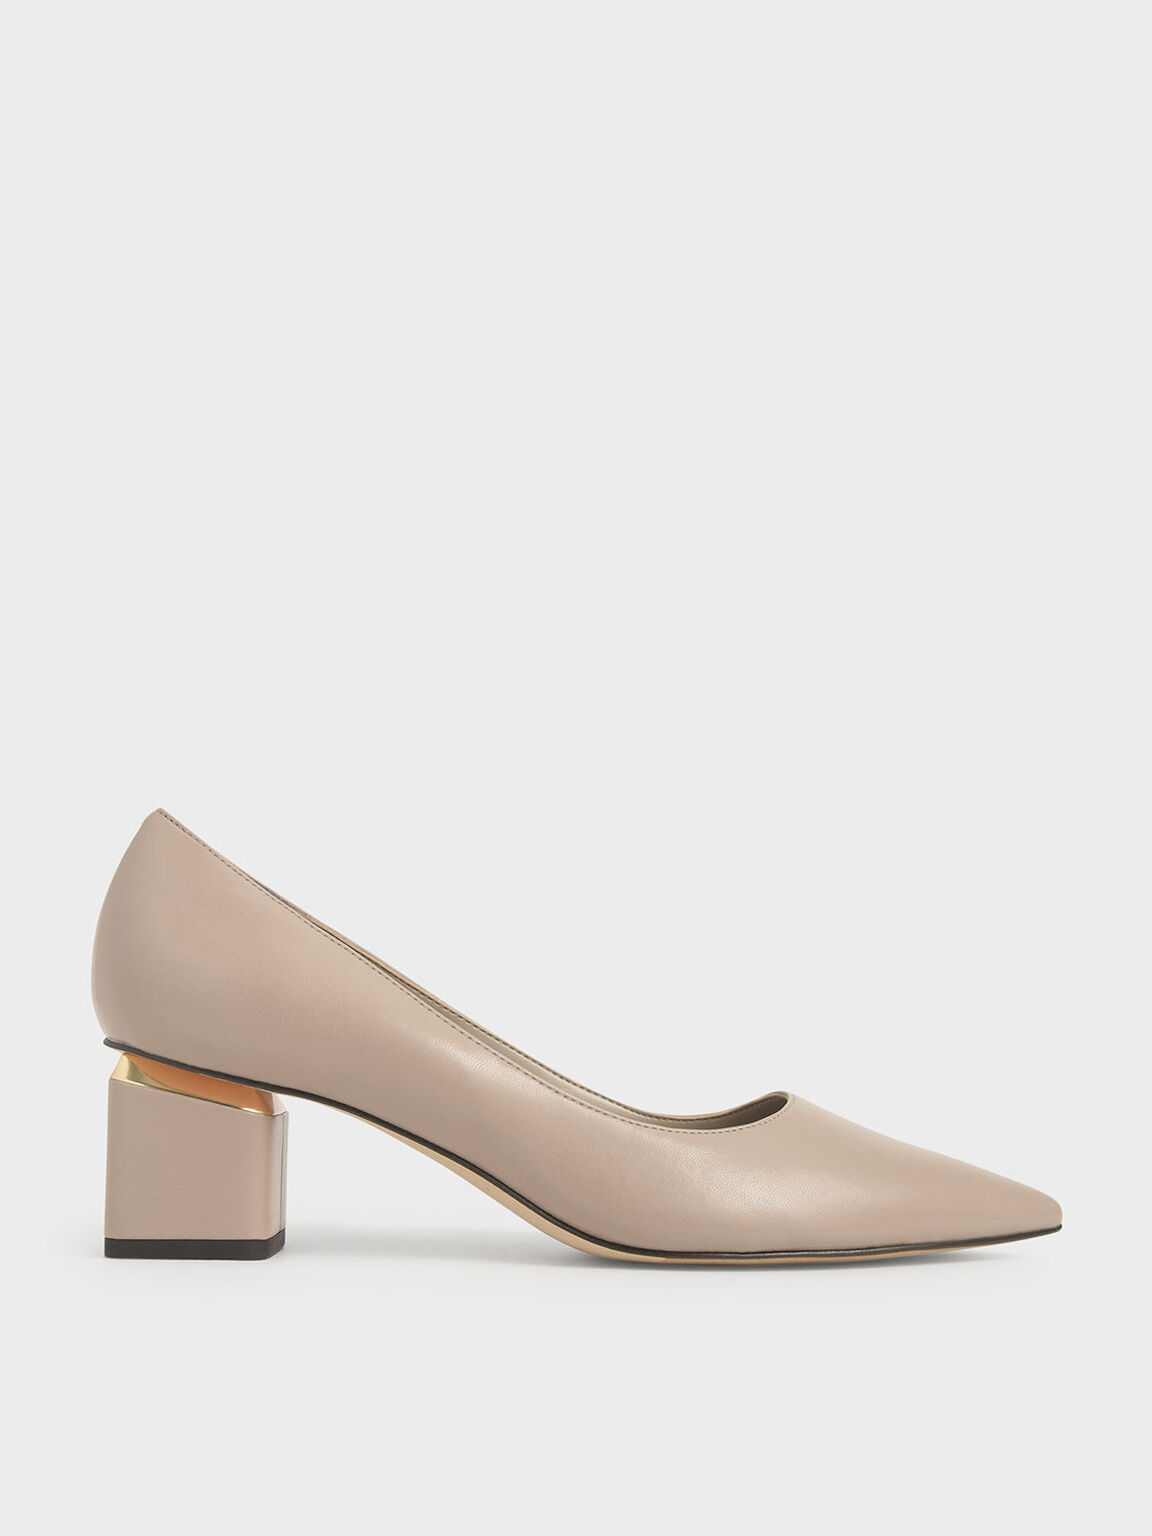 Sepatu Metal Accented Pointed Toe Pumps, Taupe, hi-res